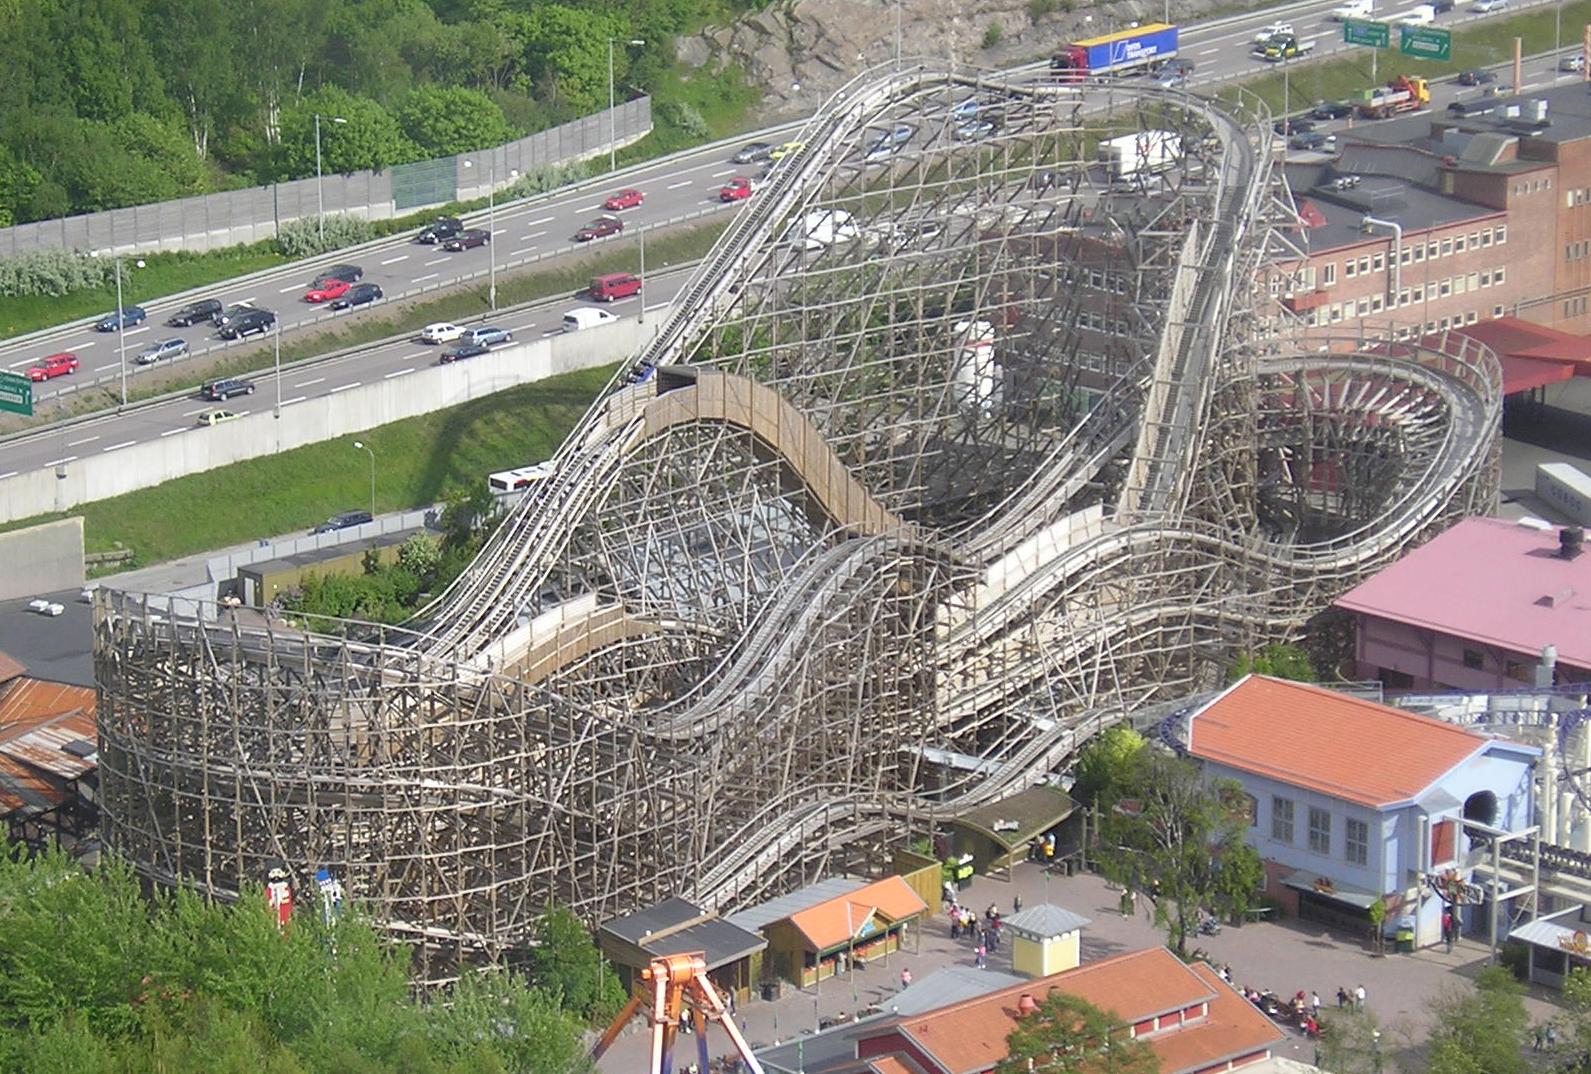 Balder_rollercoaster.jpg